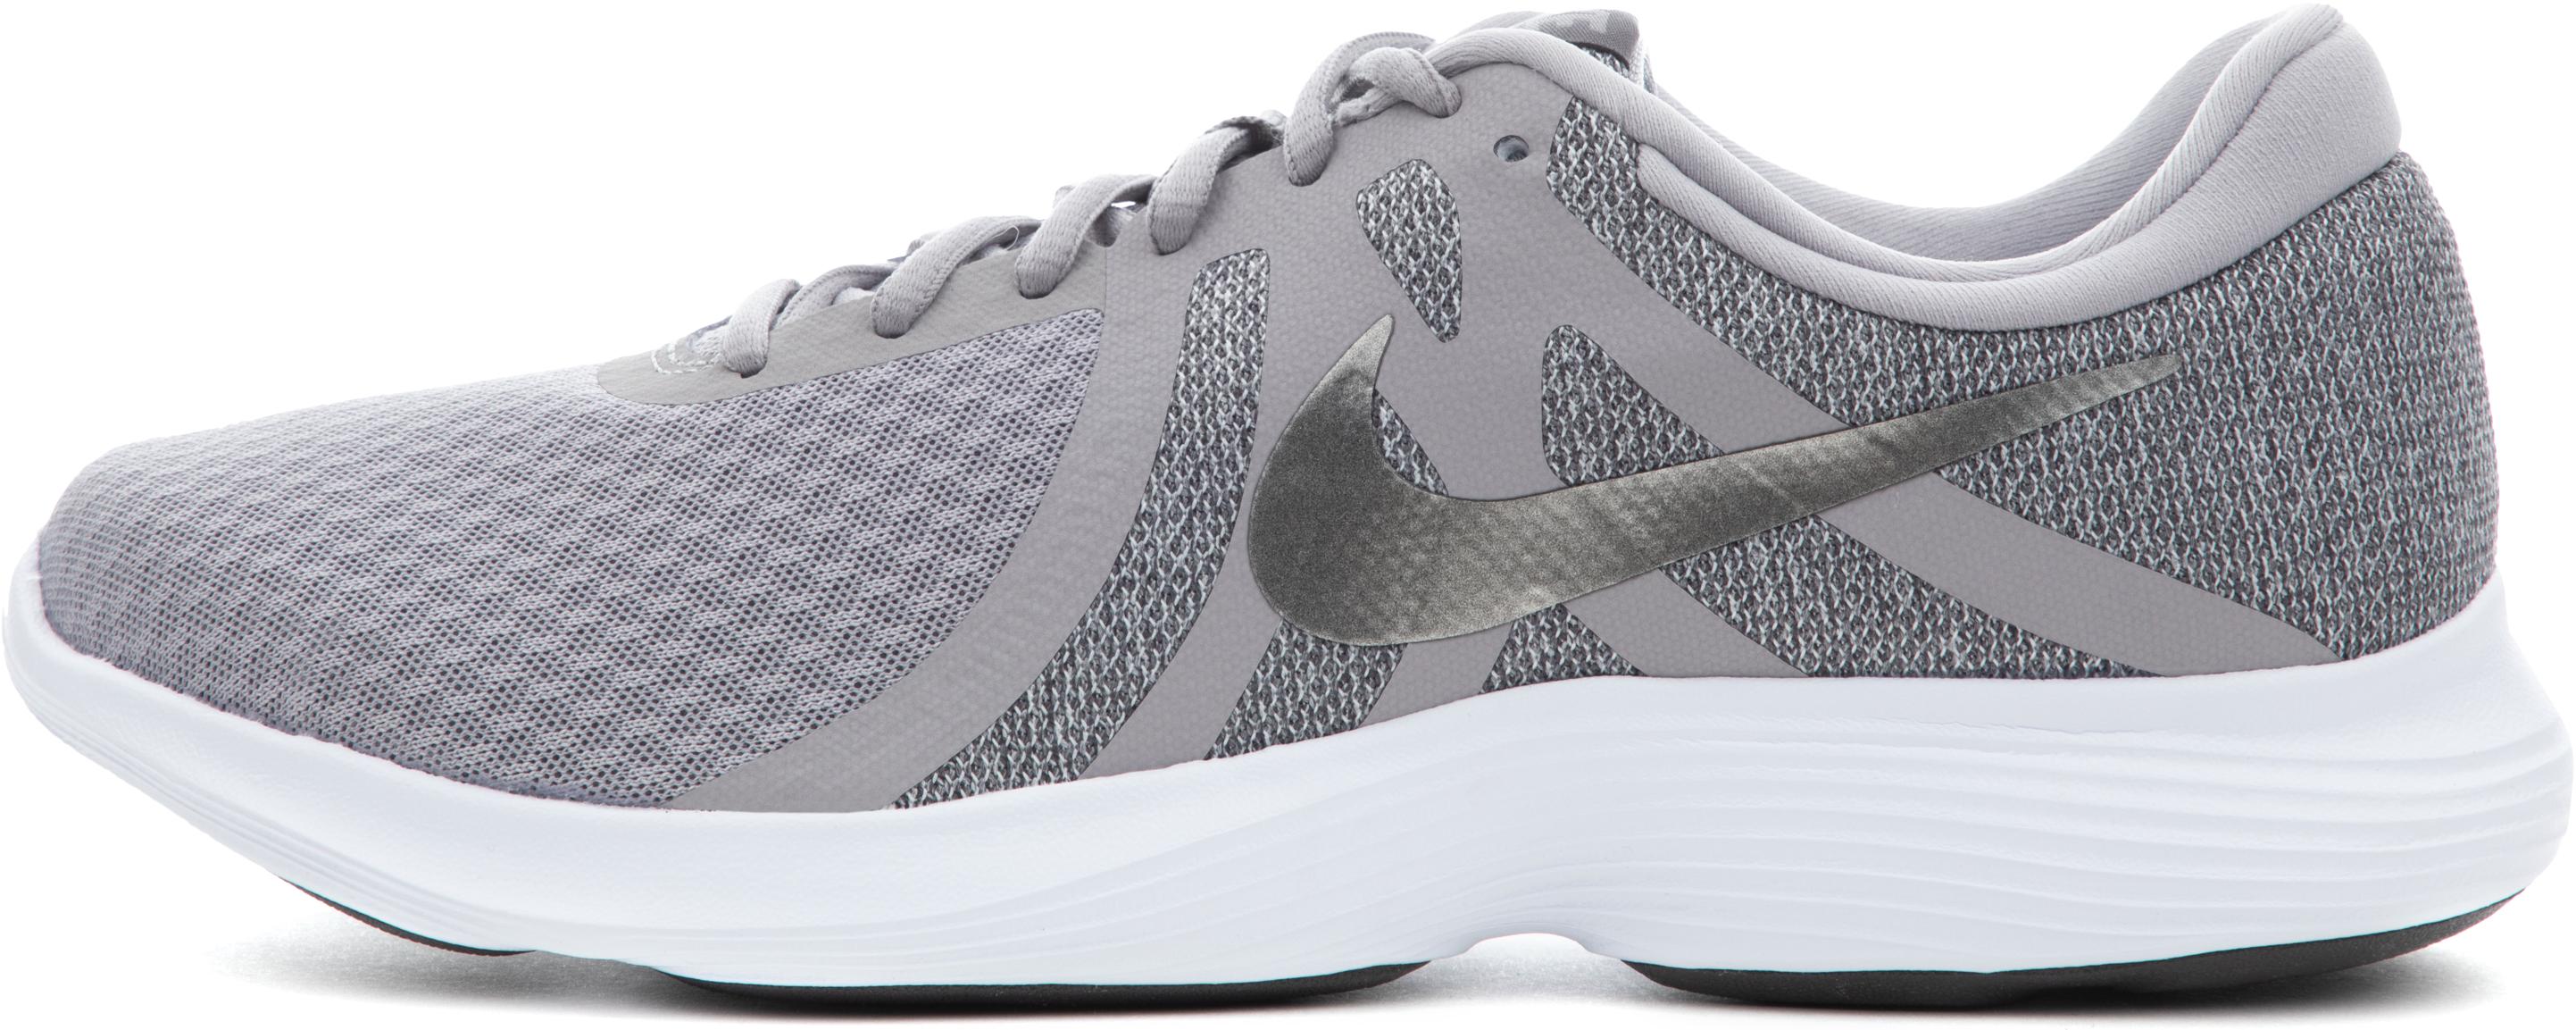 Nike Кроссовки мужские Nike Revolution 4, размер 45